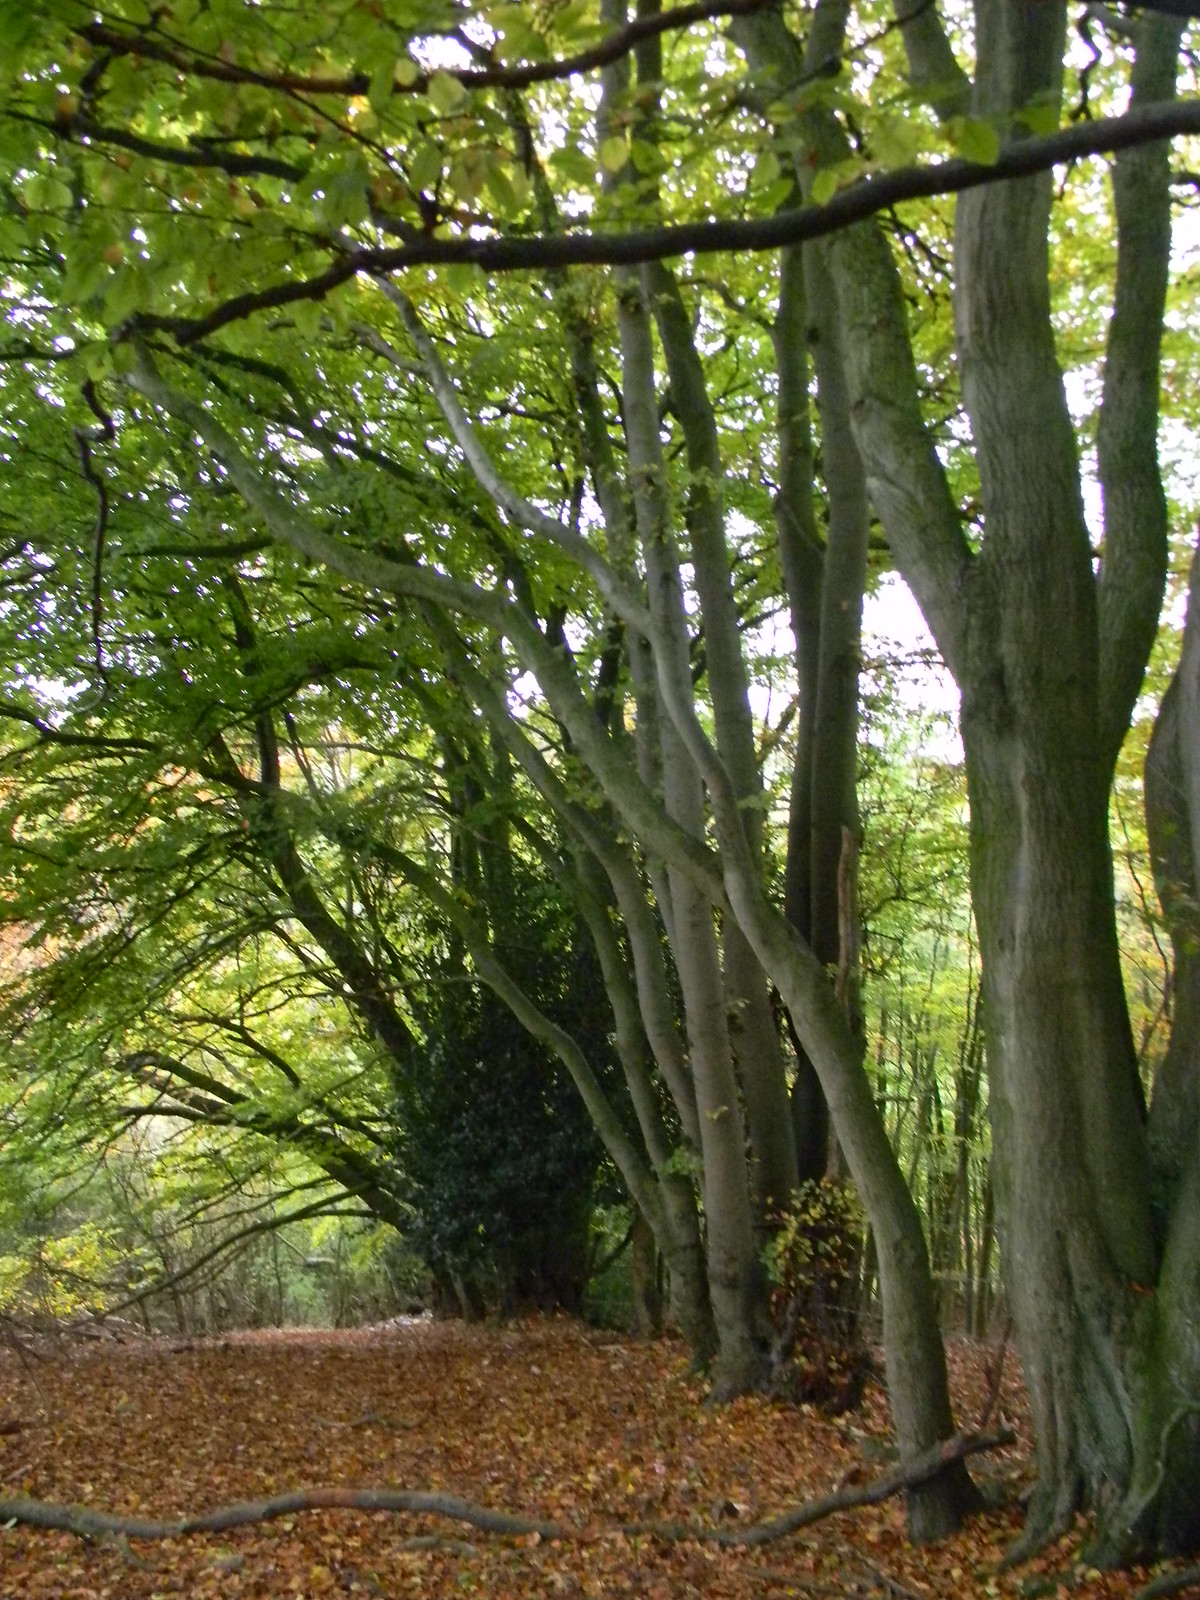 Taking a salute Monkton Wood. Princes Risborough to Great Missenden